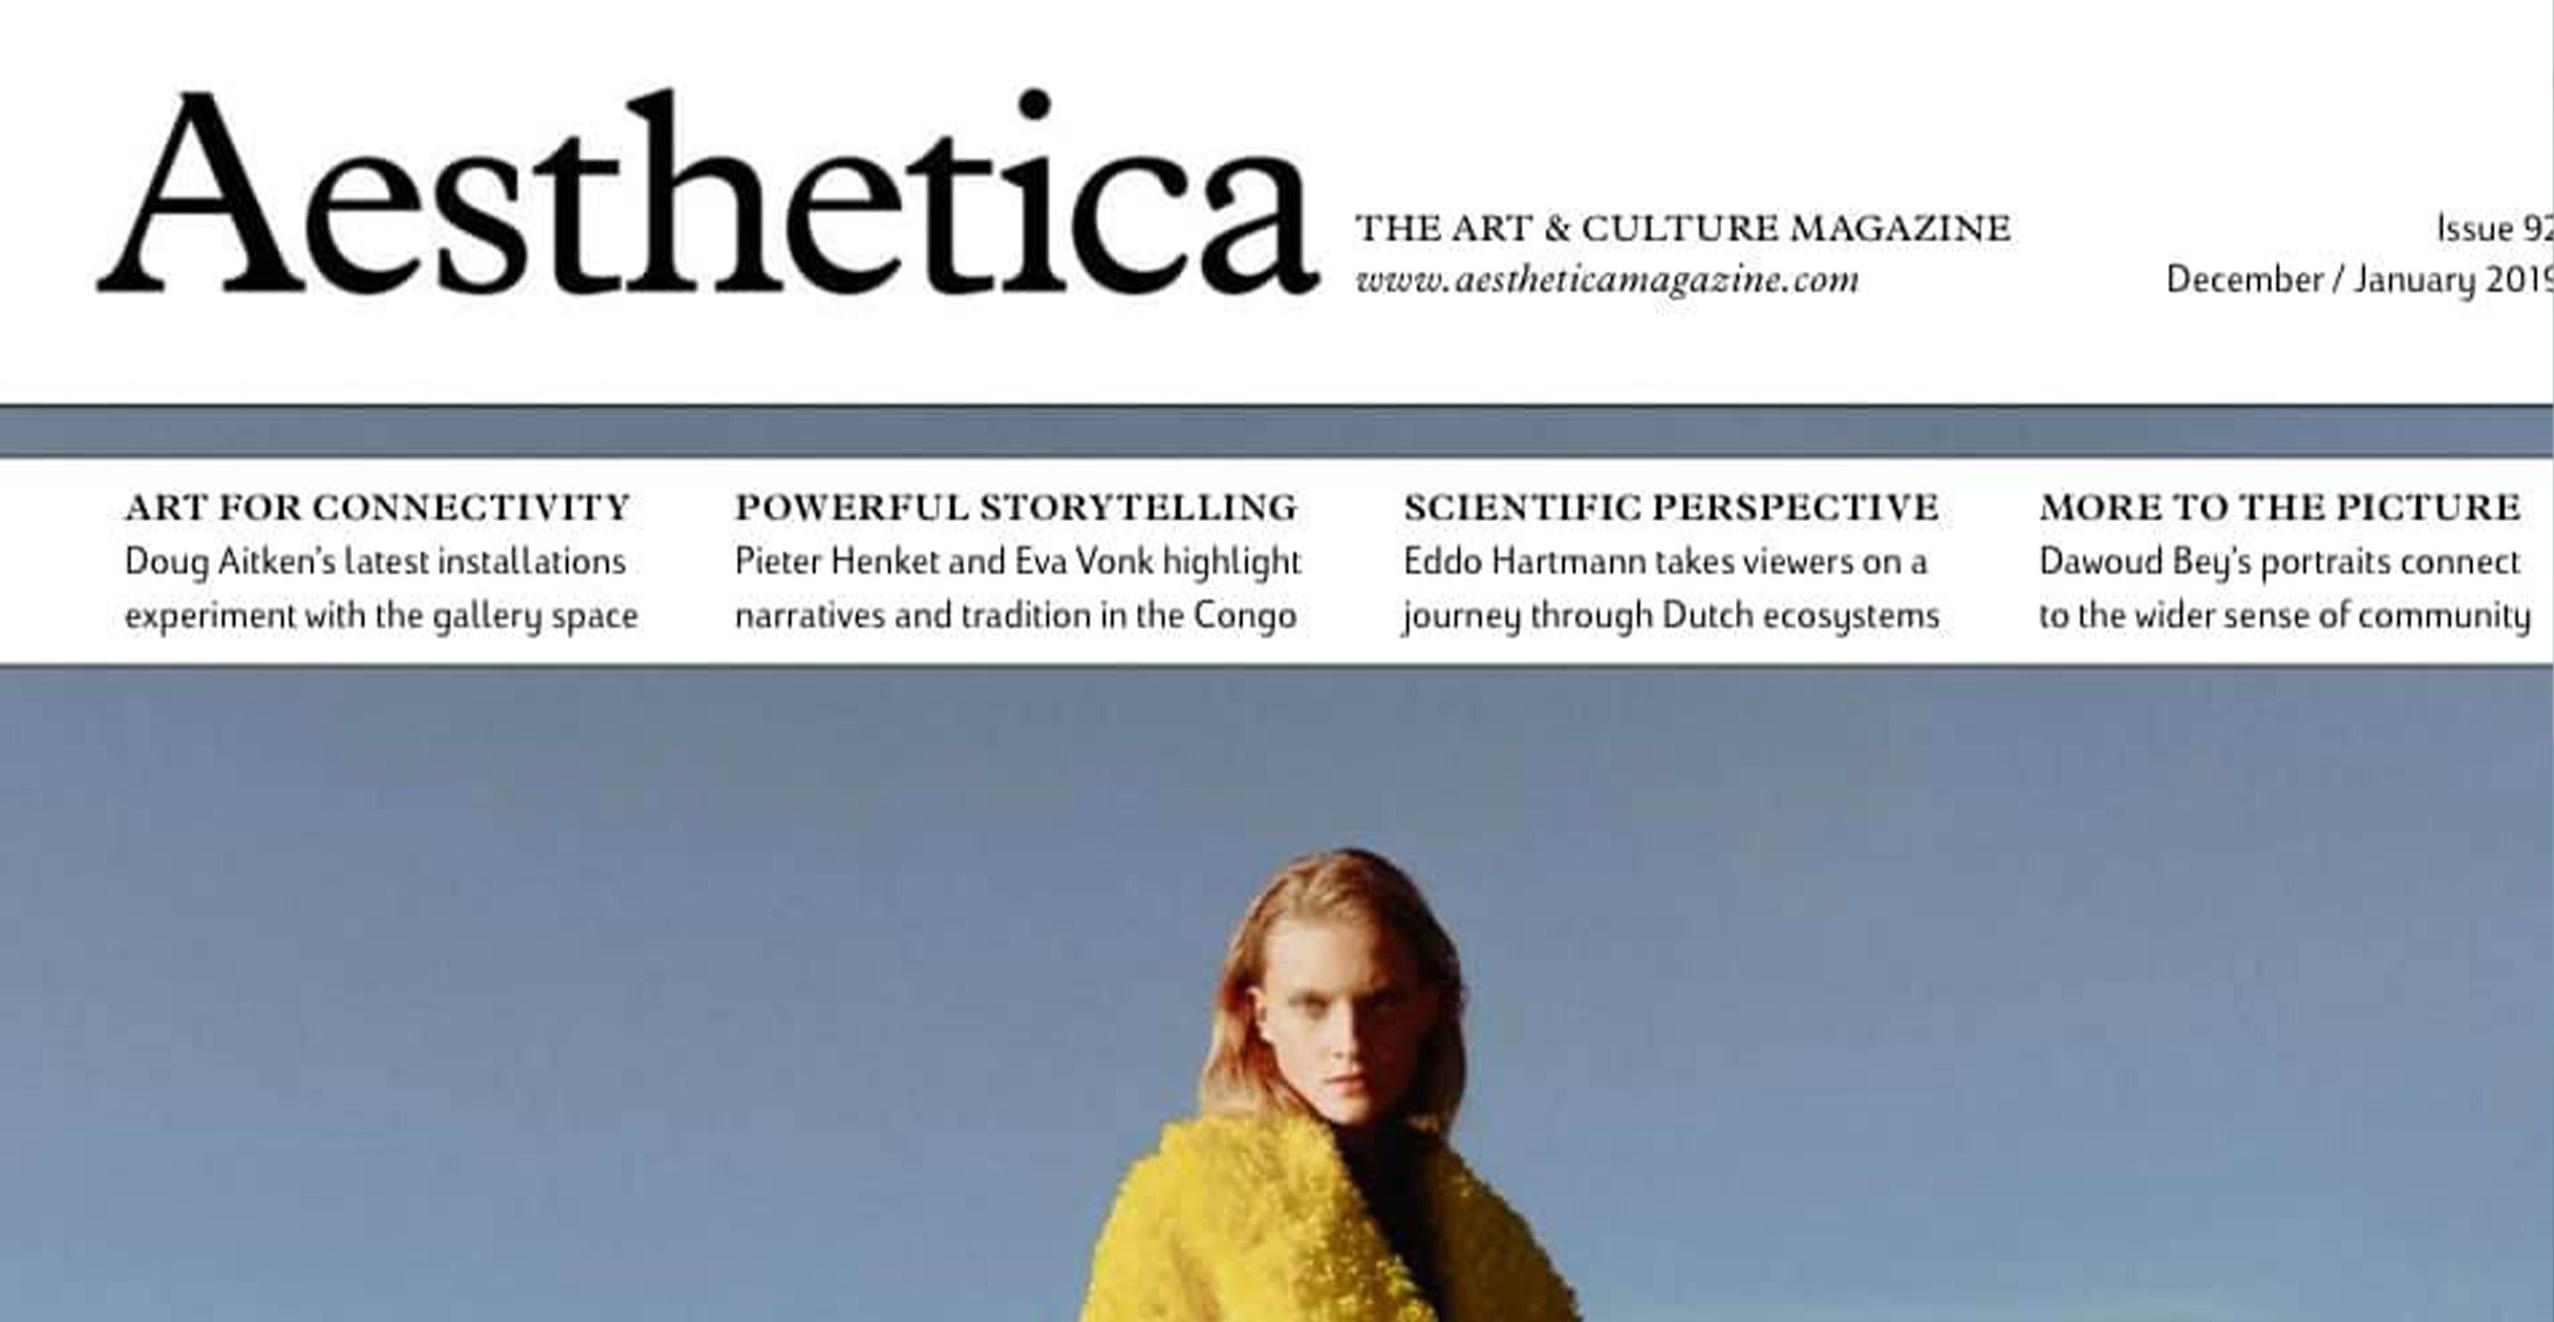 Aesthetica magazin Artist Dictionary